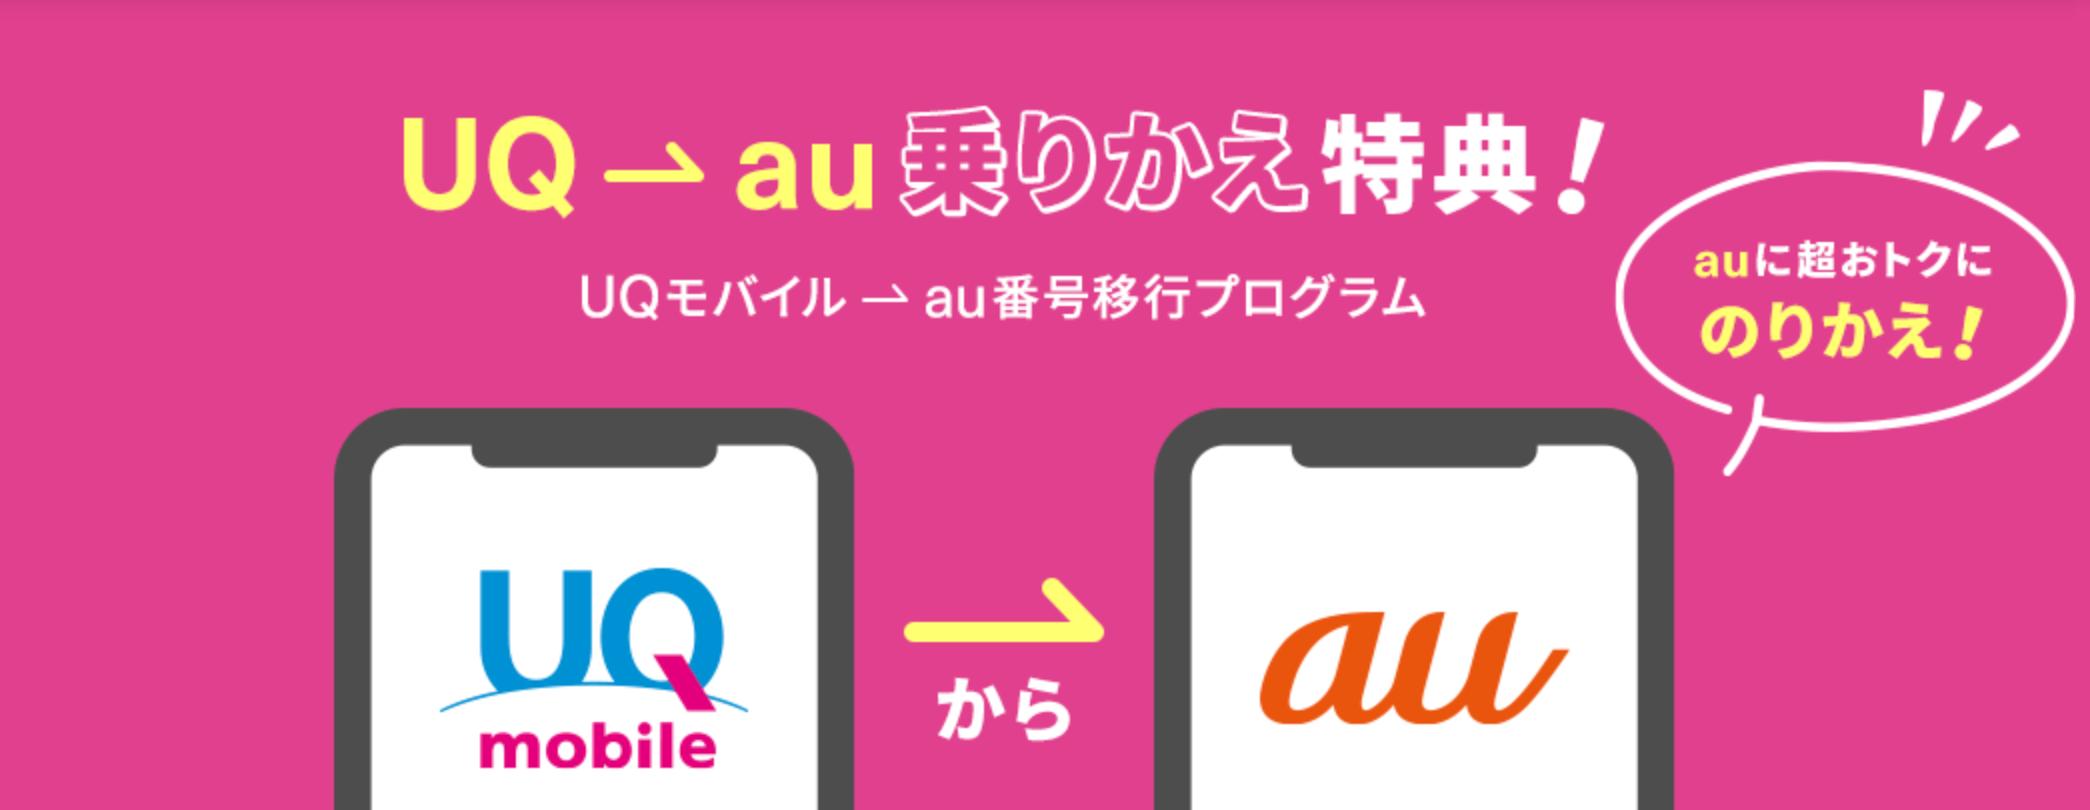 UQモバイル_口コミ_評判_キャンペーン_UQモバイル→au乗り換え特典